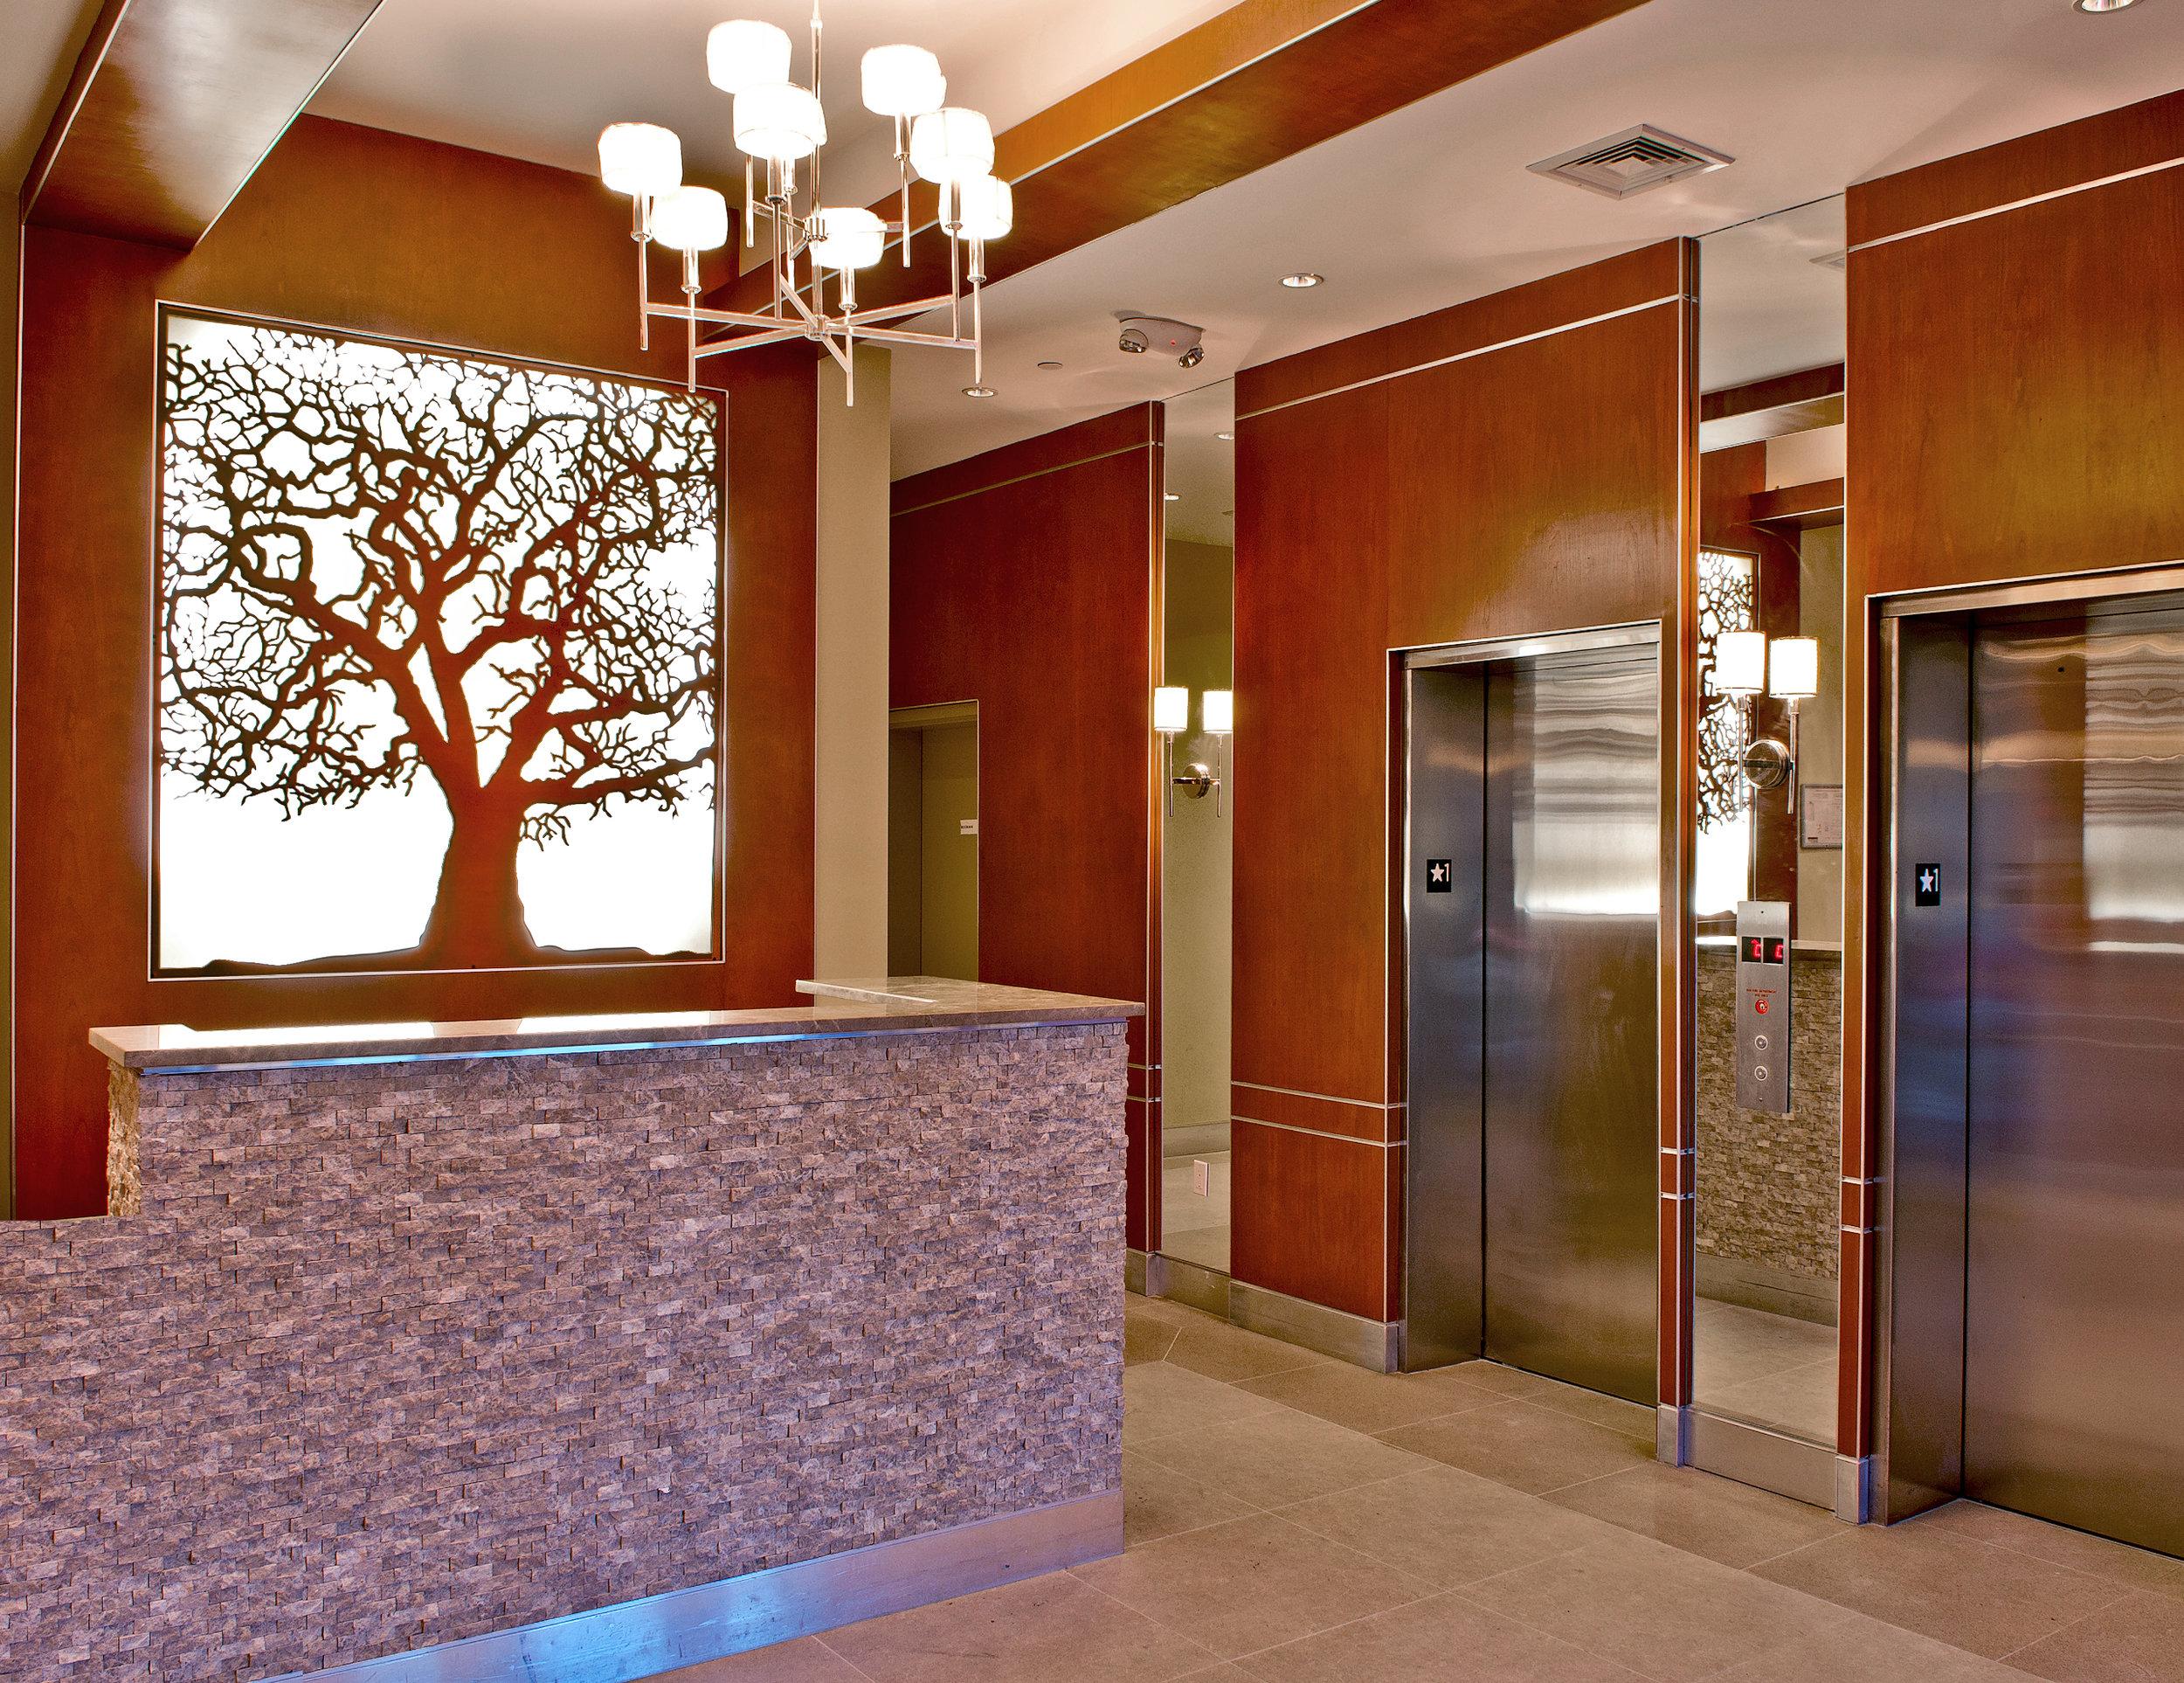 Sycamore Lobby Apartments, NY - Clearview Development  Custom Tree, backlit panel